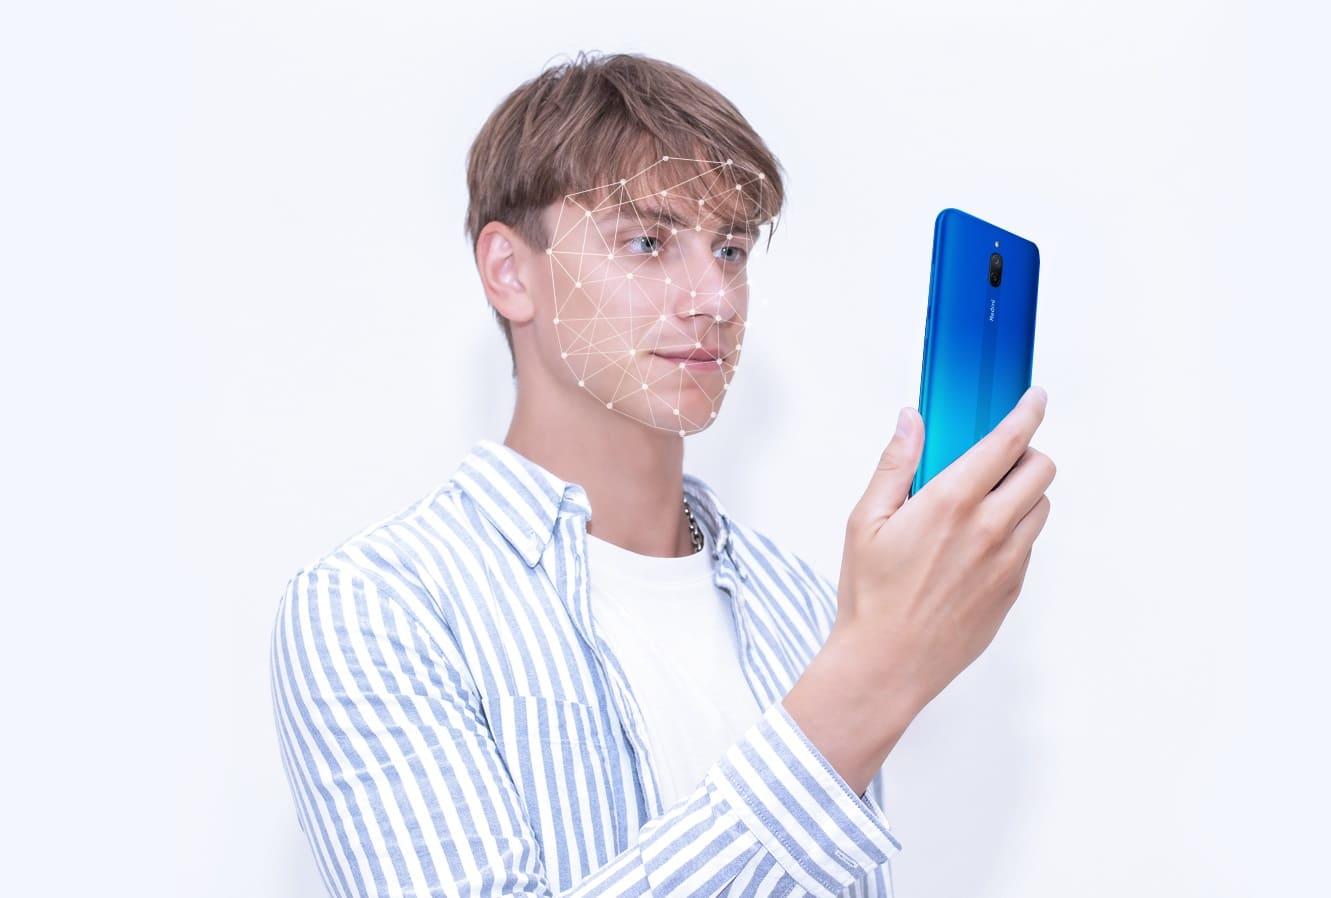 acro-phone.ru